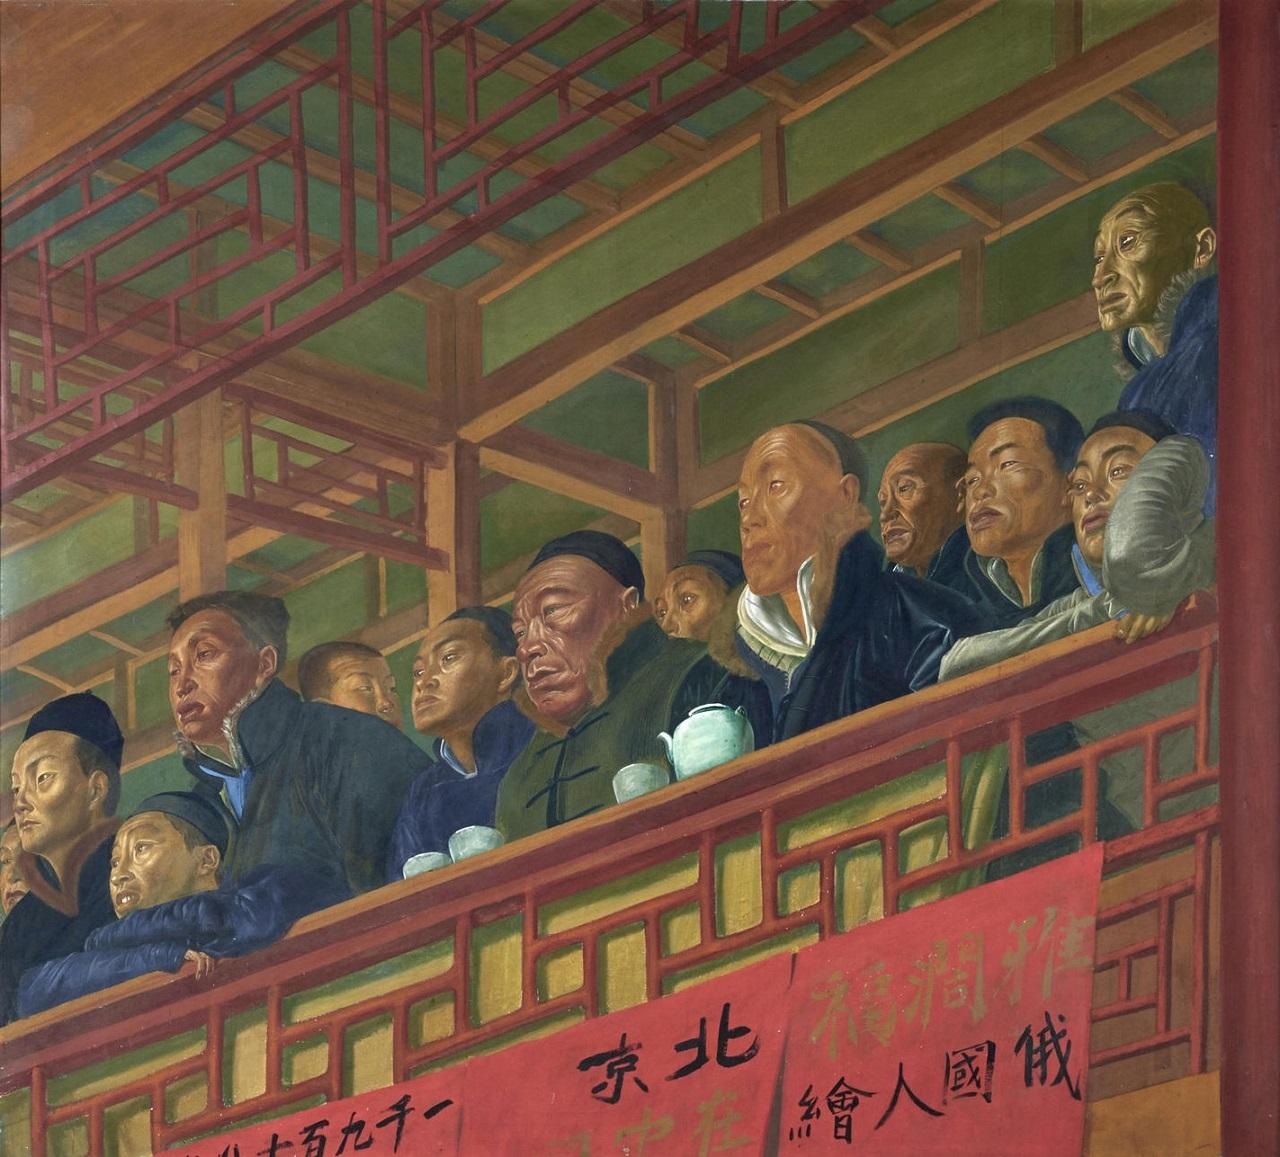 Loge de Théâtre à Pekin , 1918, Aleksandr Evgen'evich Yakovlev (1887-1938), tempera on canvas